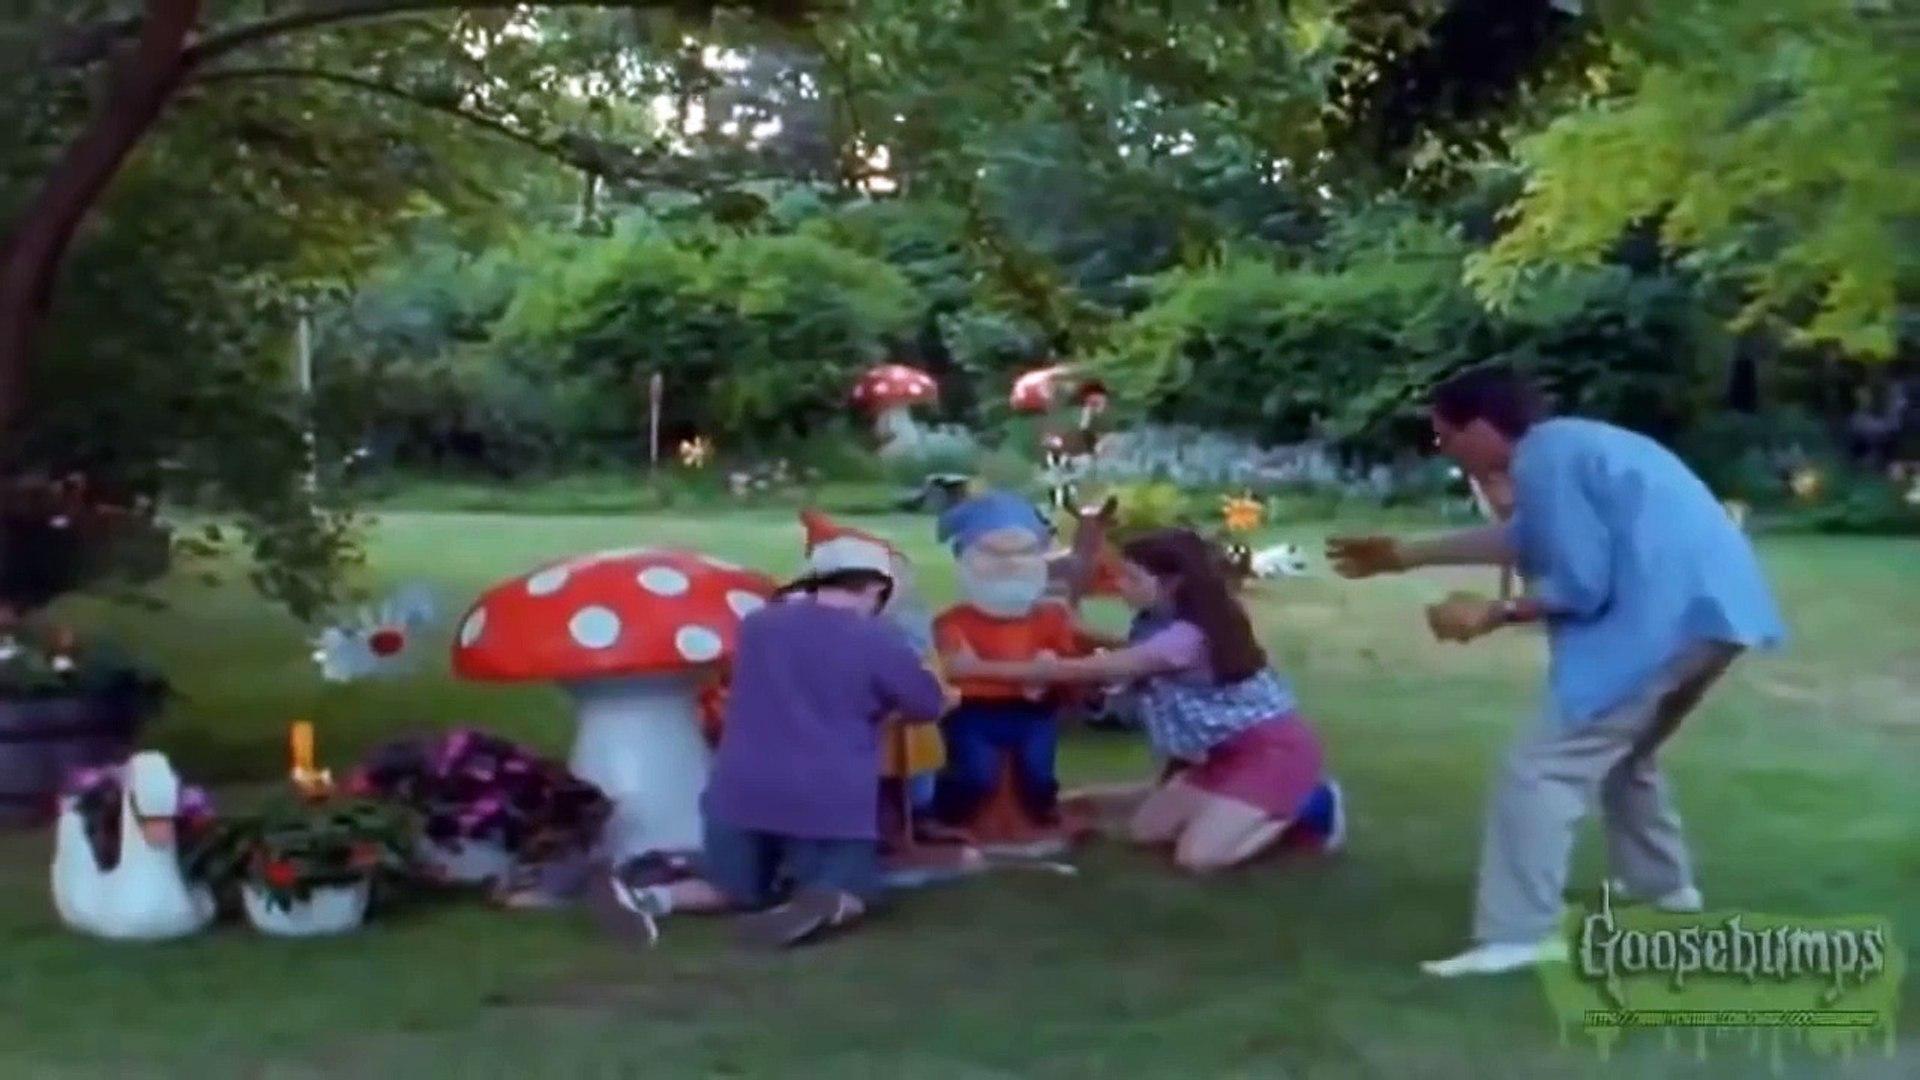 Goosebumps Revenge of the Lawn Gnomes 2015 New HD